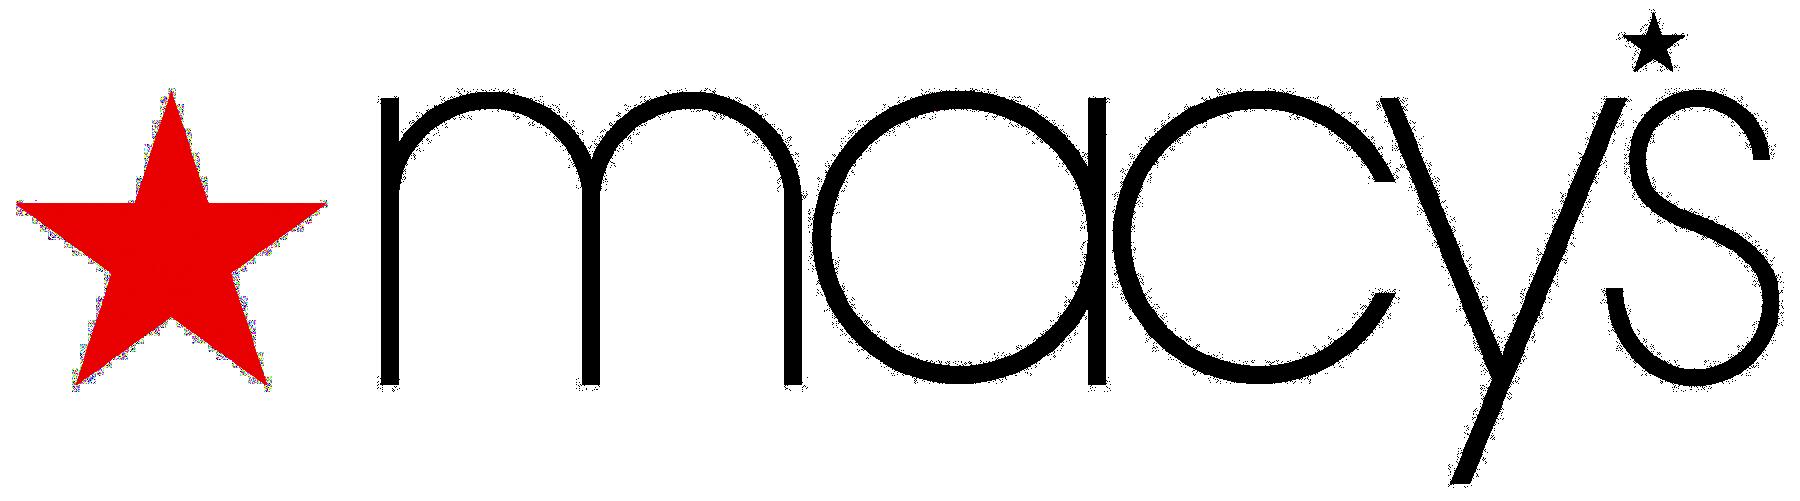 GRATIS Macy's Savings Card logo